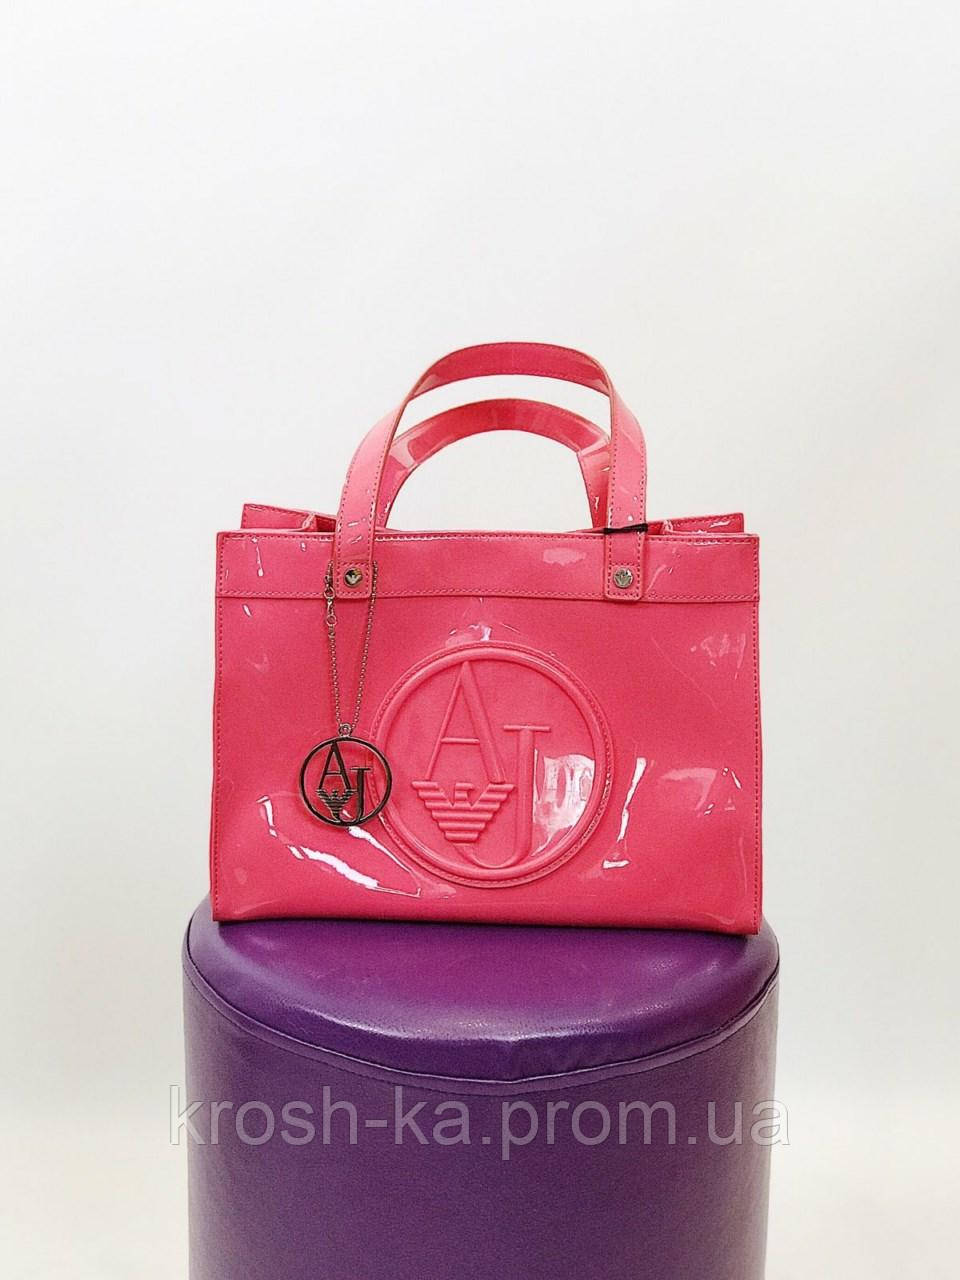 Сумка шопер женская  Armeni Гонконг розовая лаковая 0520